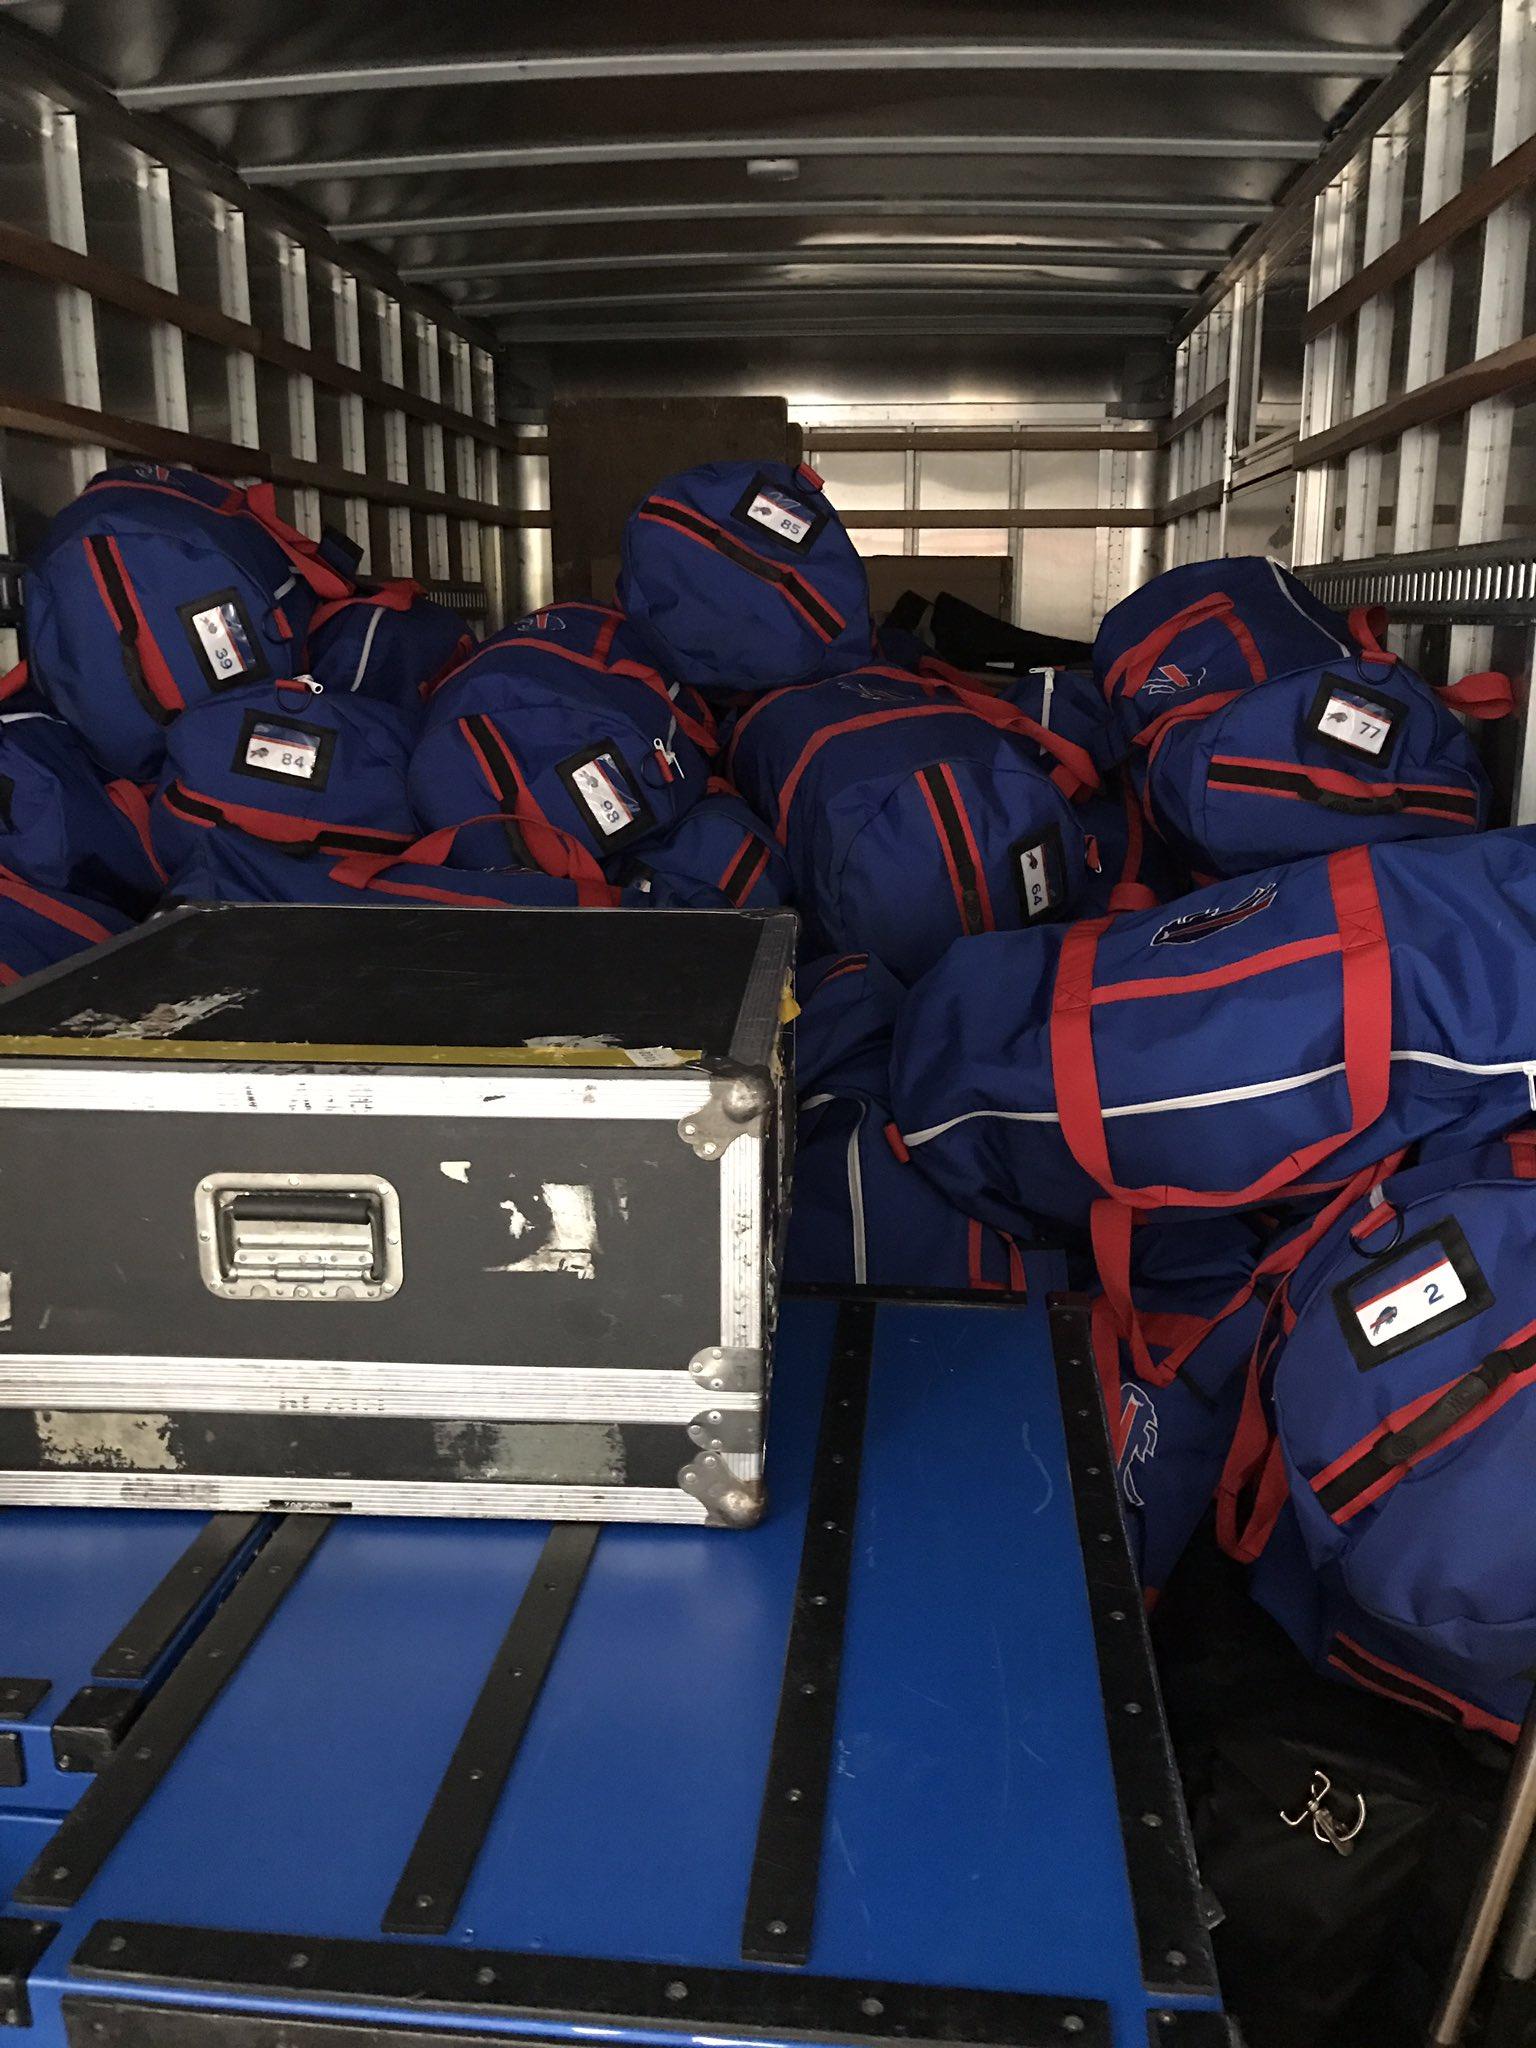 Equipment truck packed for Oakland. Go #Bills https://t.co/QKNjWoNhGs